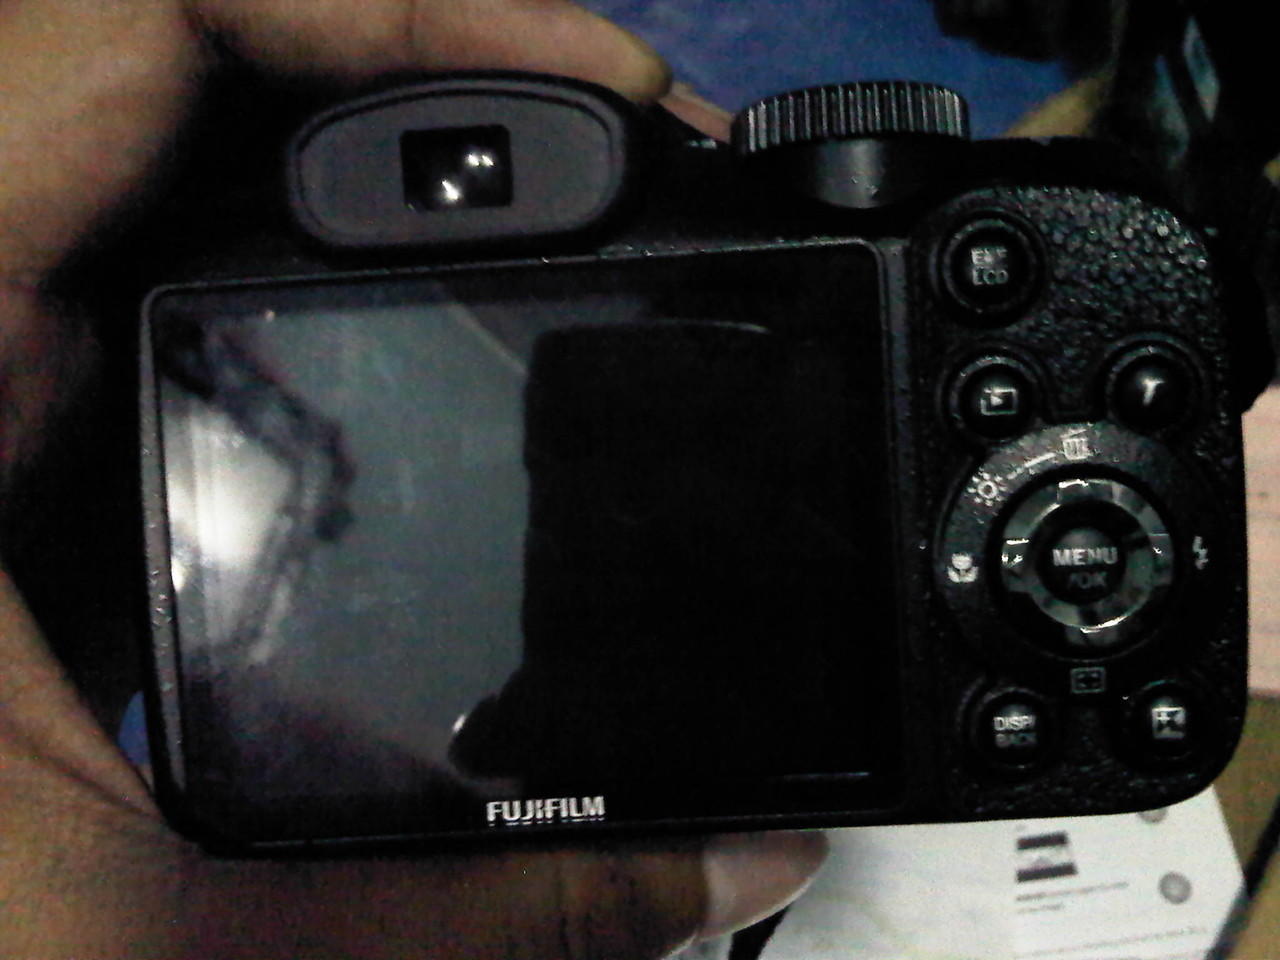 {JUAL} Prosumer Fujifilm S2800HD masi garansi Lengkap Kinyis2 ex cewe